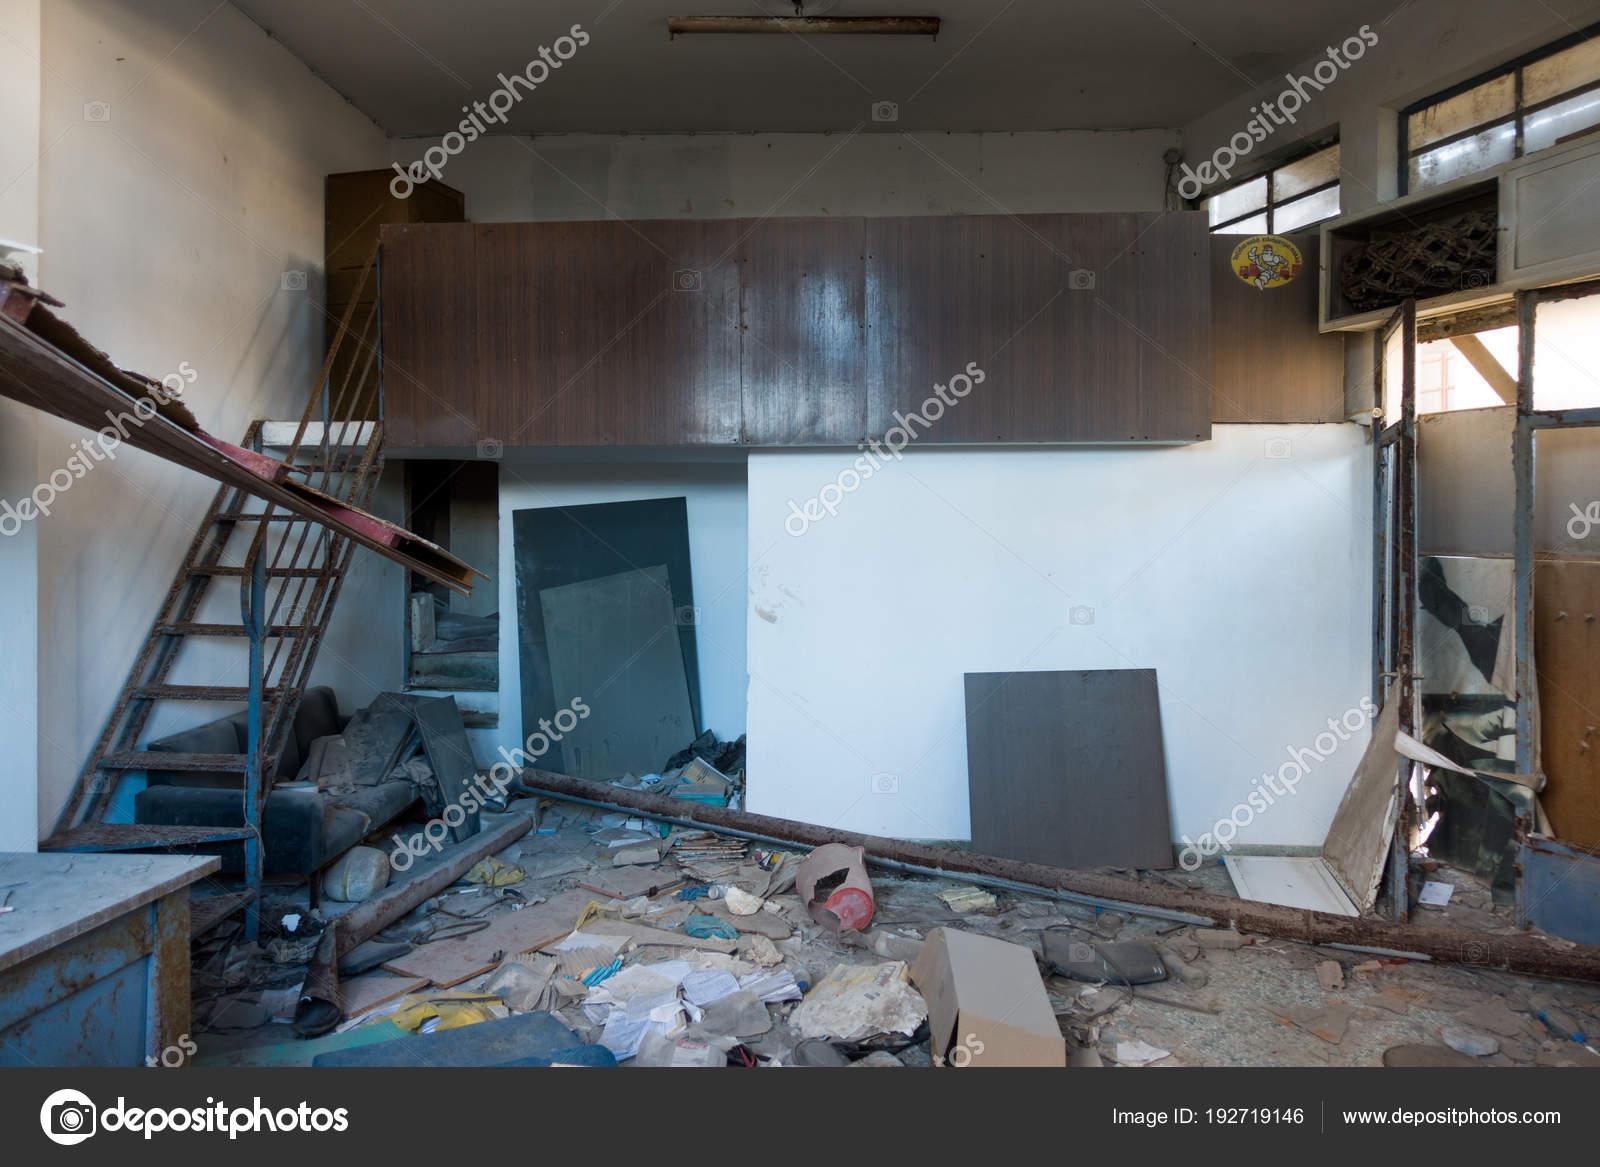 Casa Abandonada Suja Heraklion Gr Cia Stock Photo Bruno135